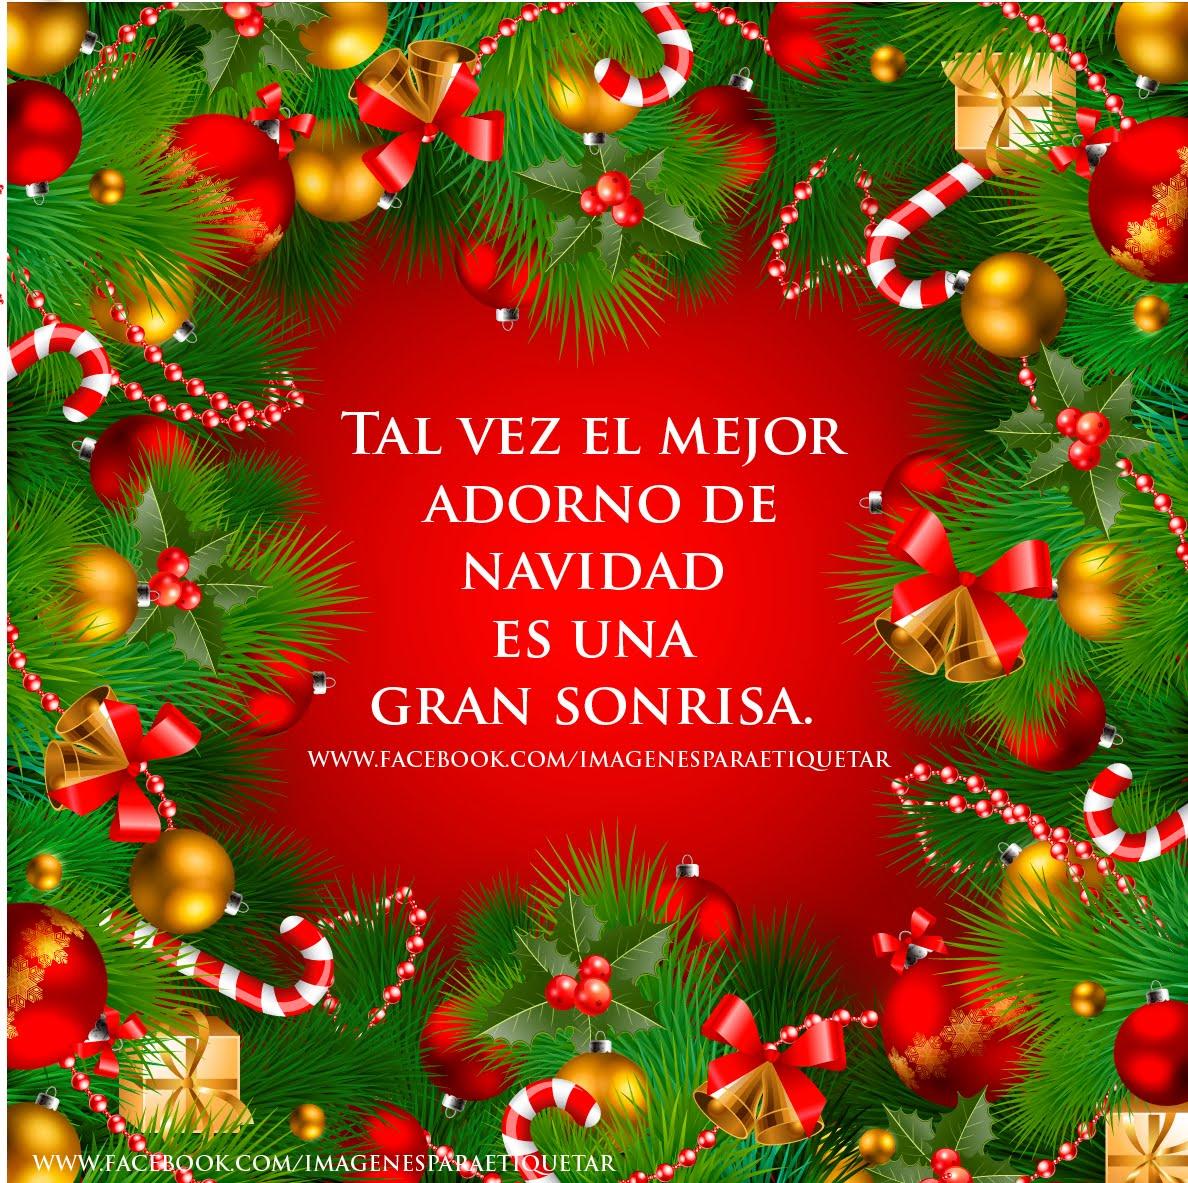 Frase para navidad universo guia - Frases navidenas para empresas ...